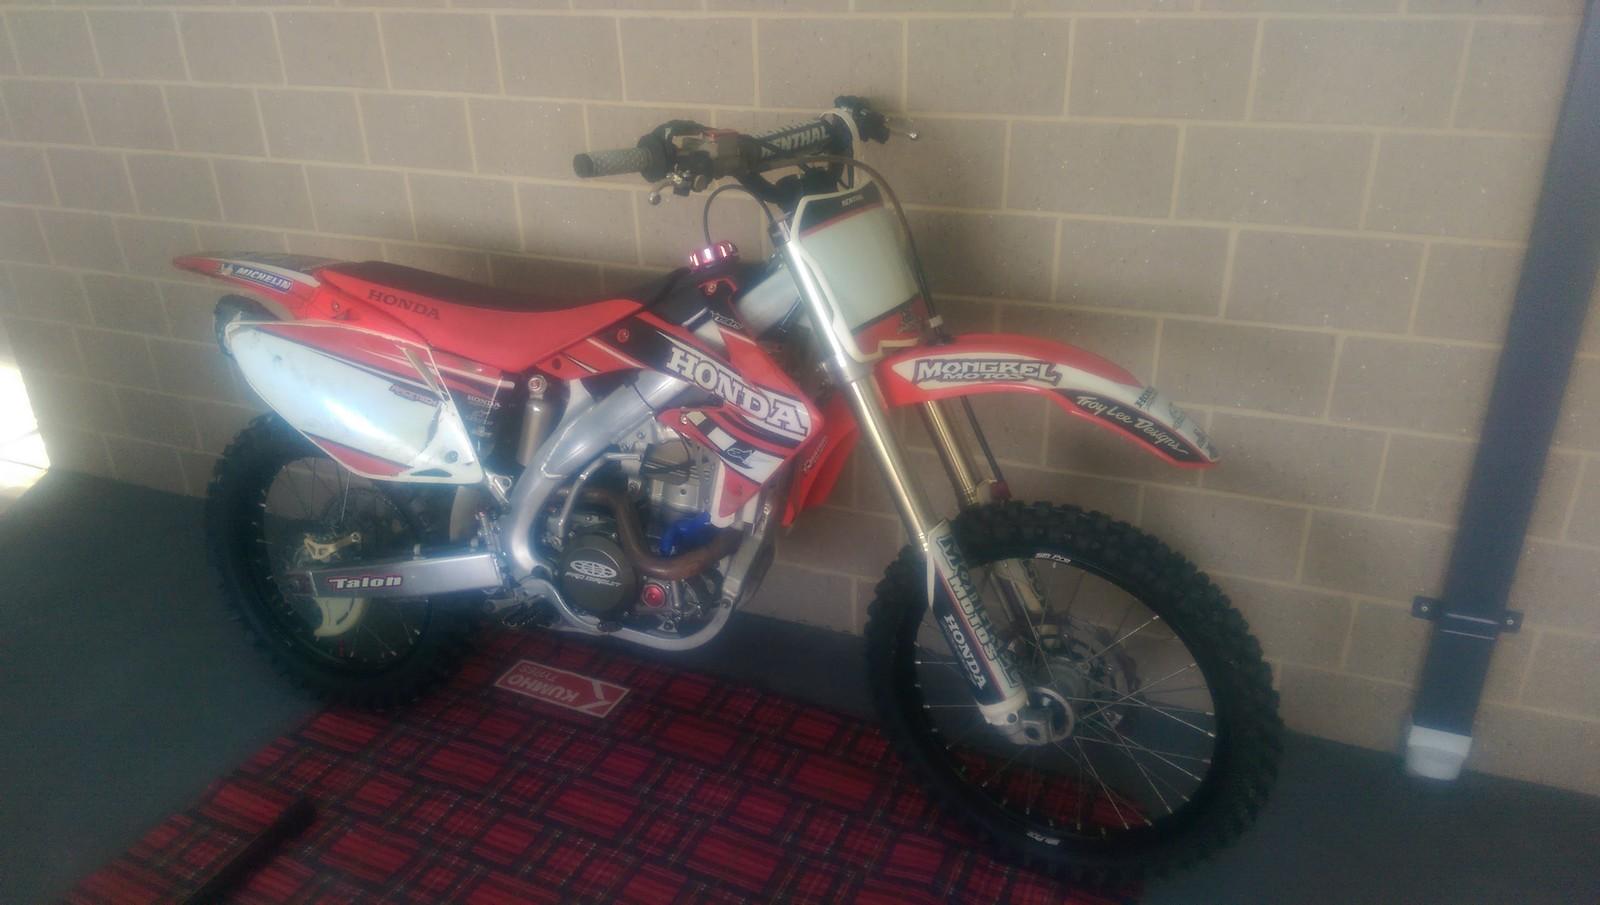 IMAG0214 - dougy6790 - Motocross Pictures - Vital MX